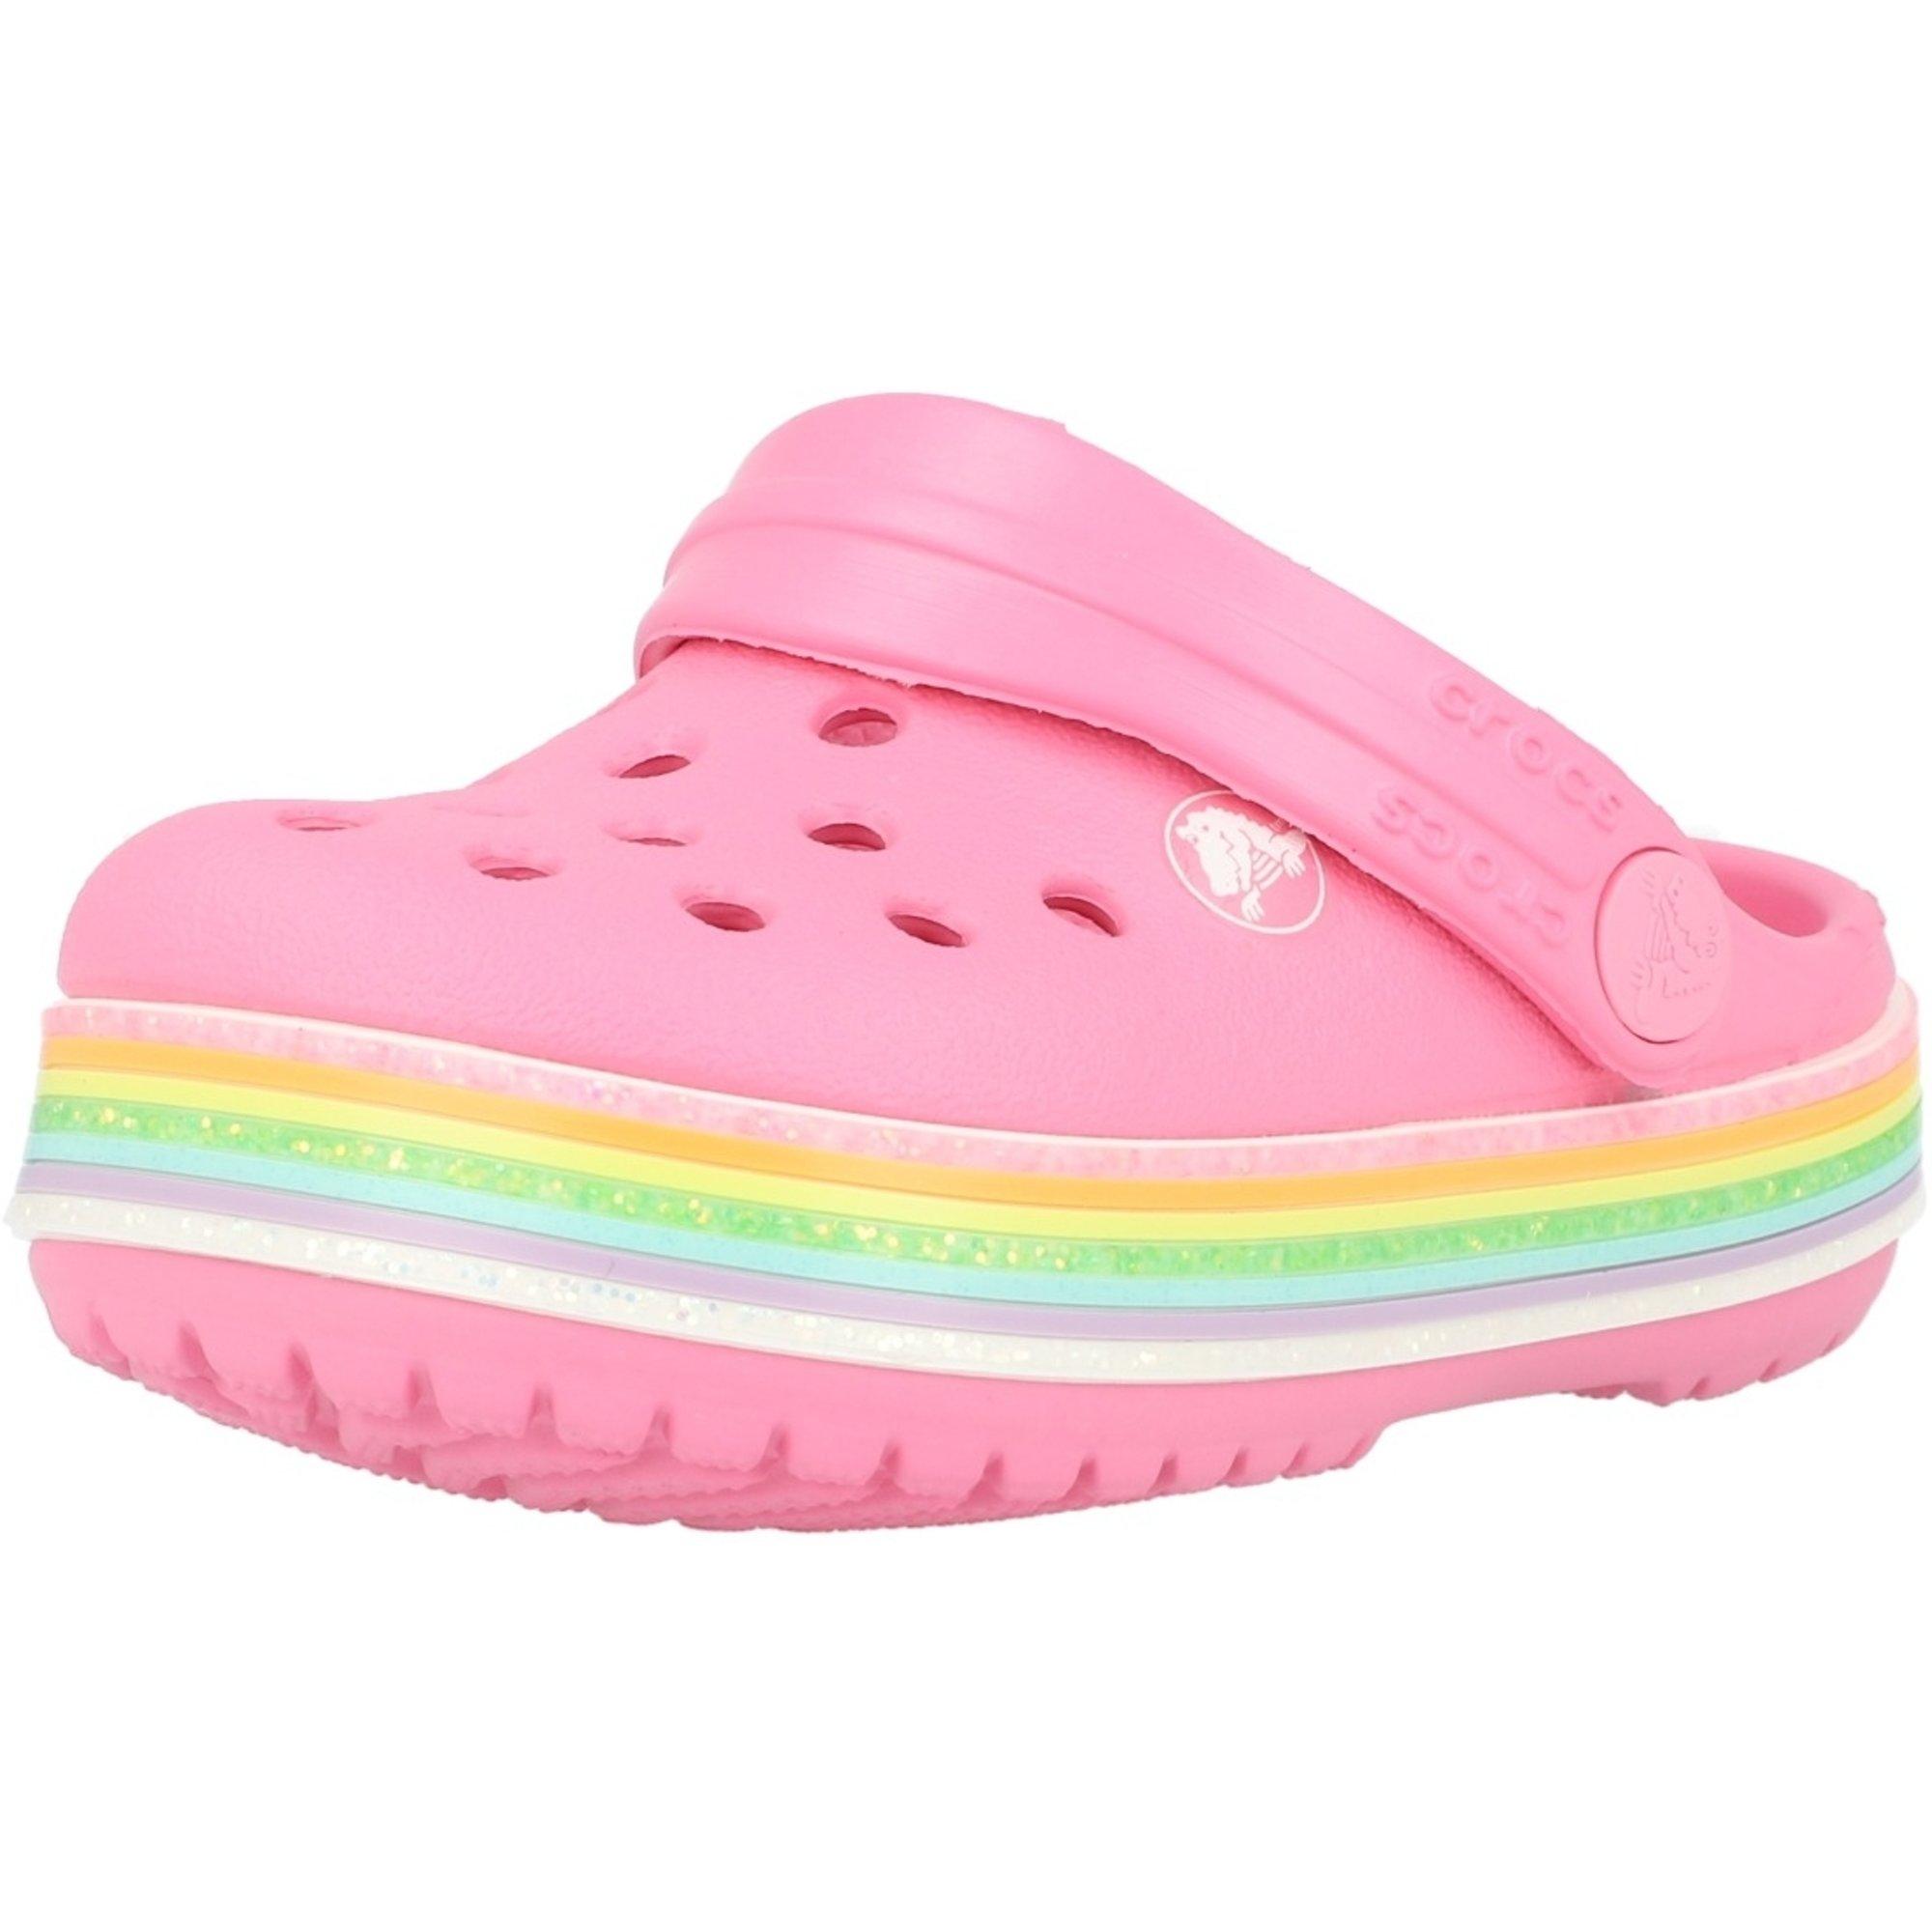 Crocs Kids Crocband Rainbow Glitter Clog Pink Lemonade Croslite